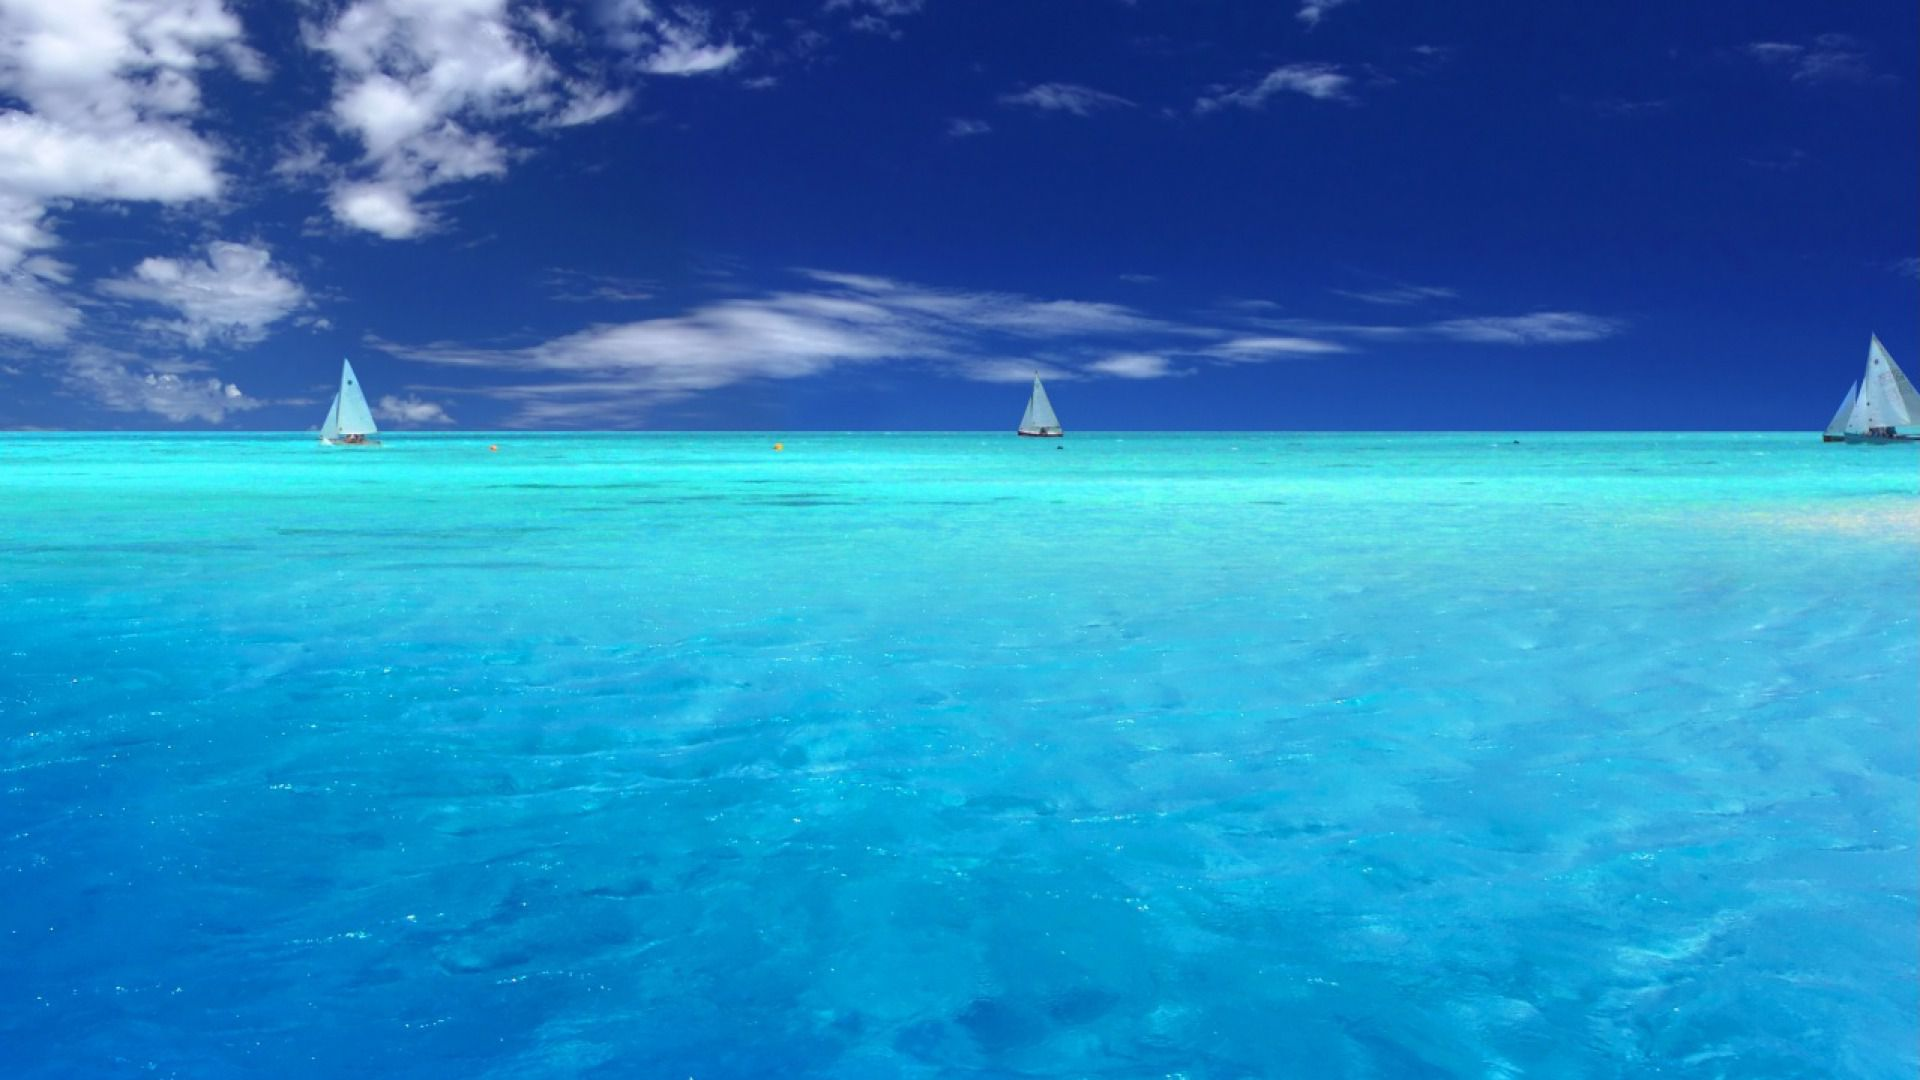 15 Free Ocean Wallpapers For Your Desktop or Phone